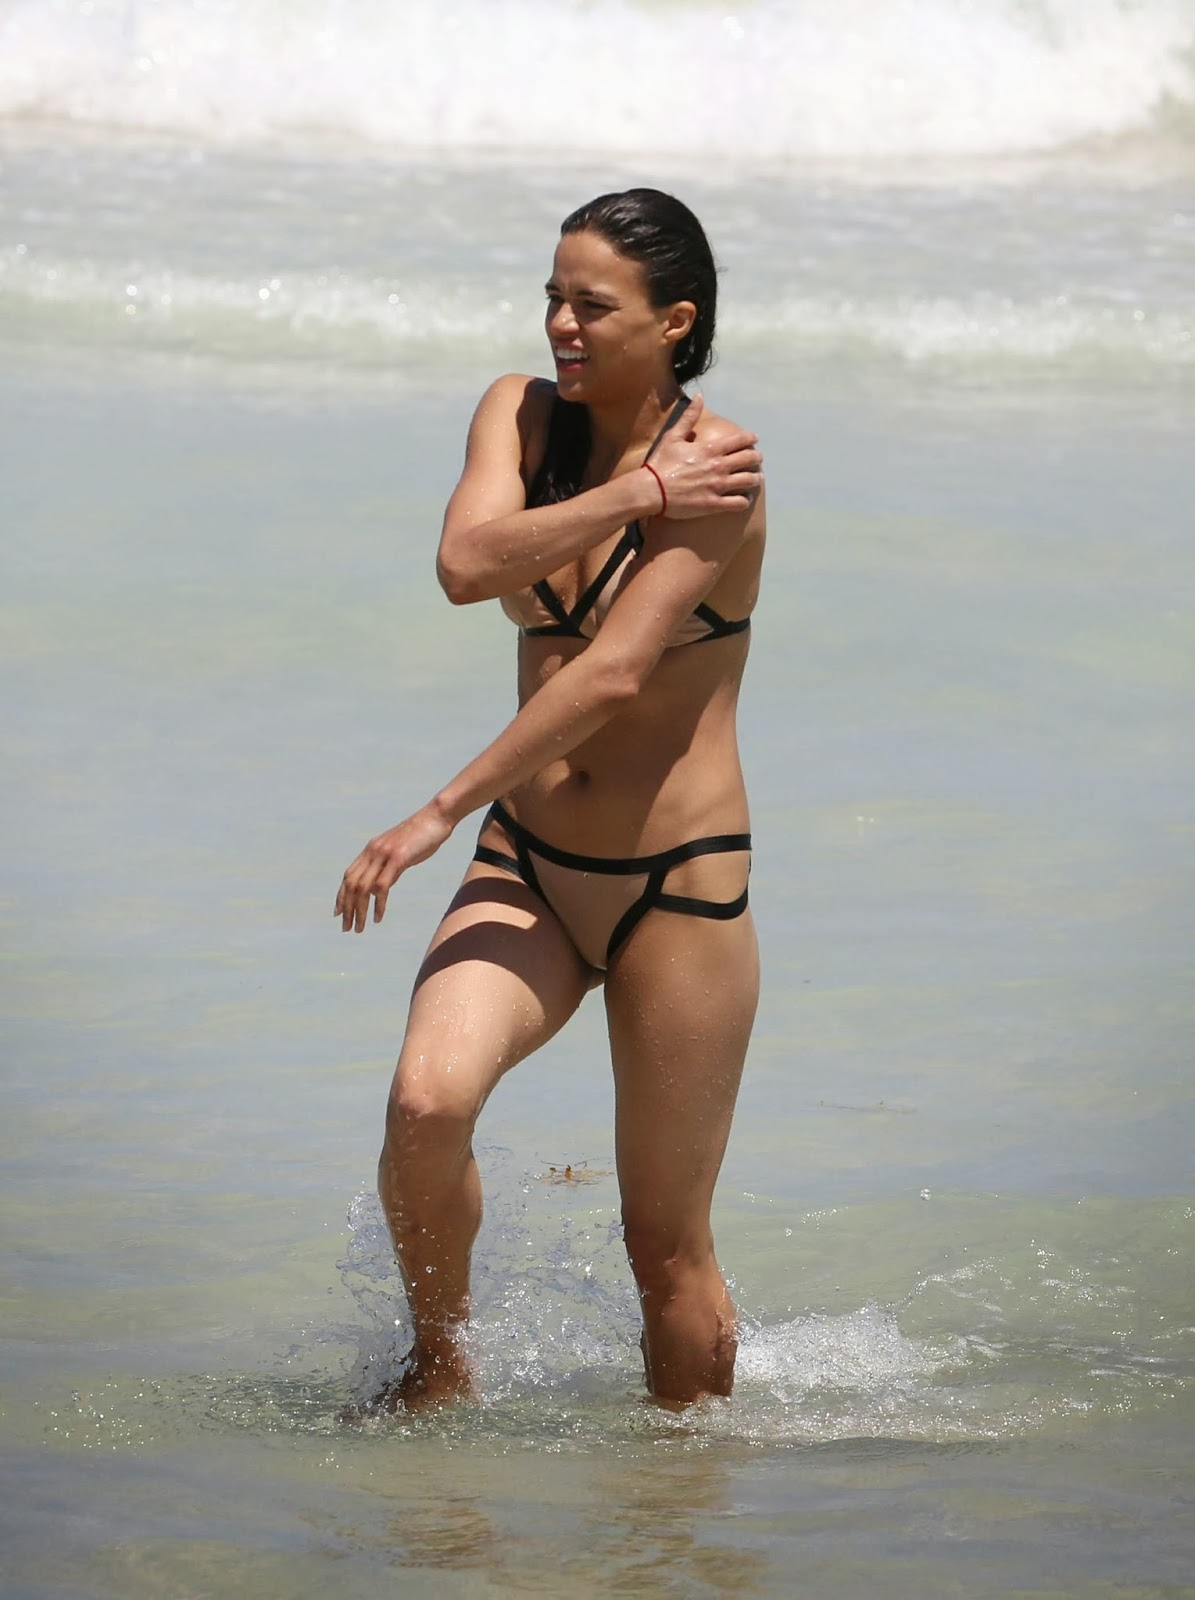 Michelle Rodriguez Bikini Bodies Pic 5 of 35